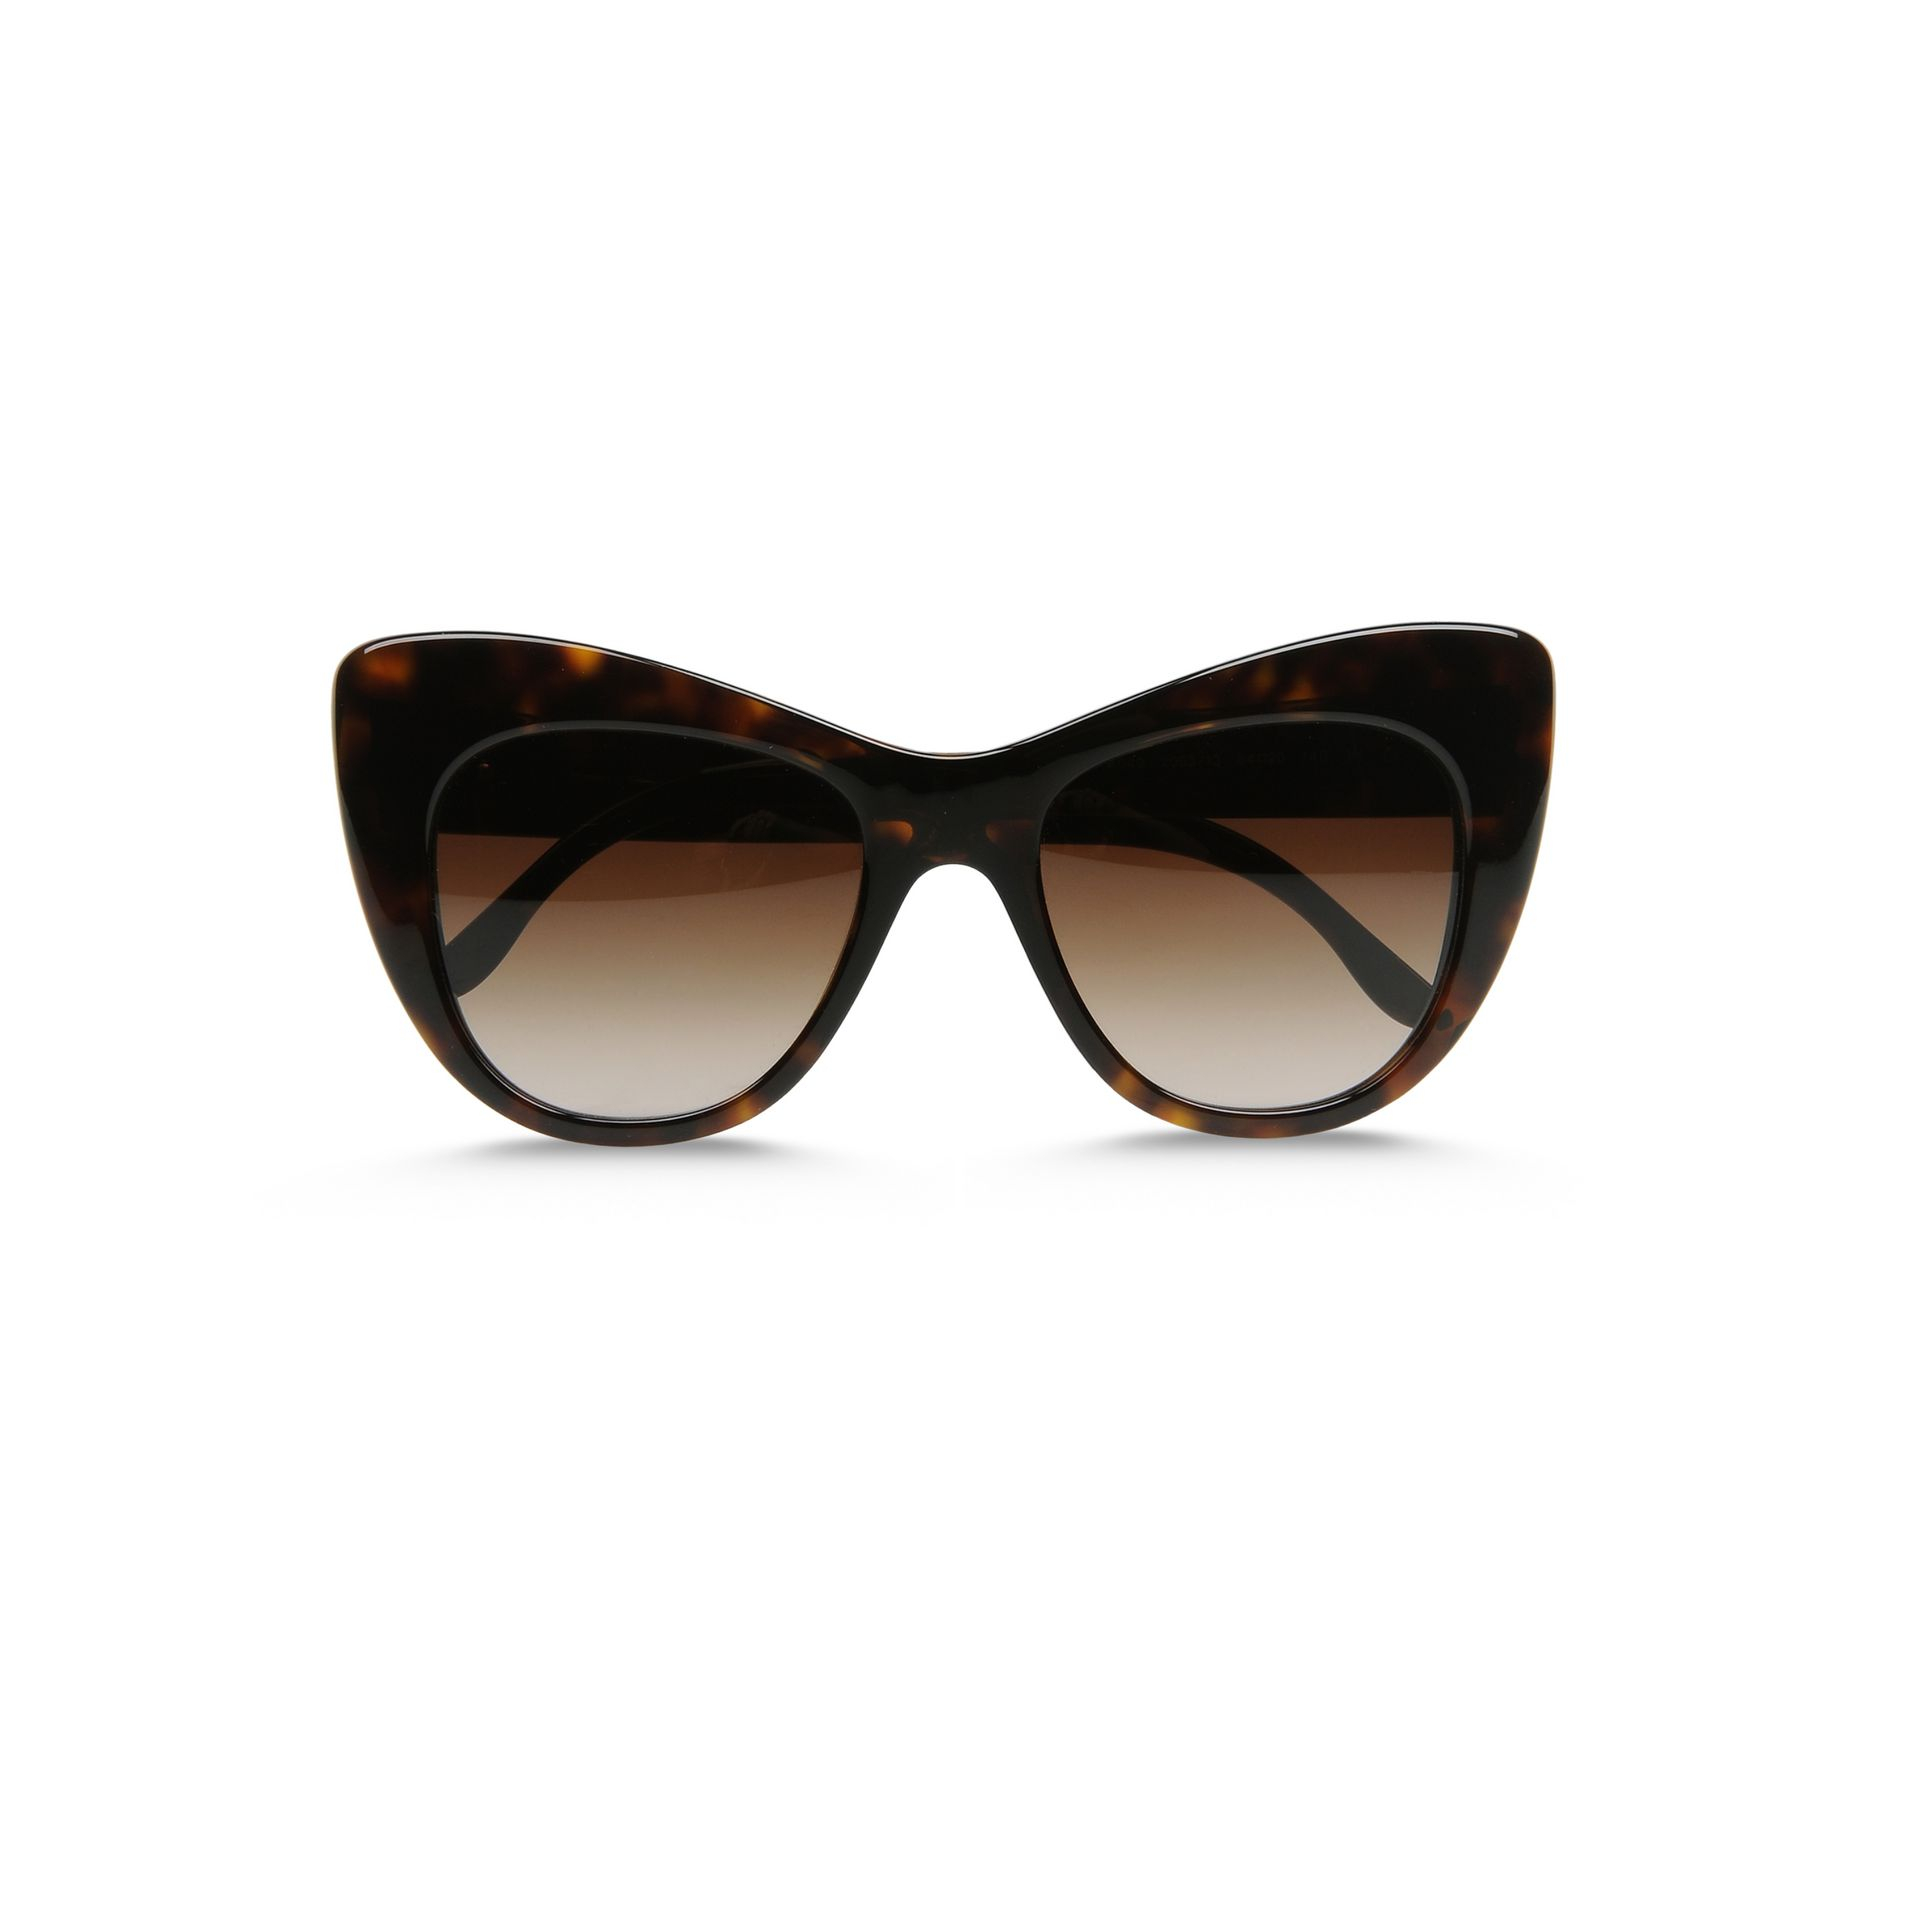 Oversized Stella Exaggerated Cat Eye Pin Up Girl Big Large: Stella McCartney Oversized Cat Eye Sunglasses In Dark